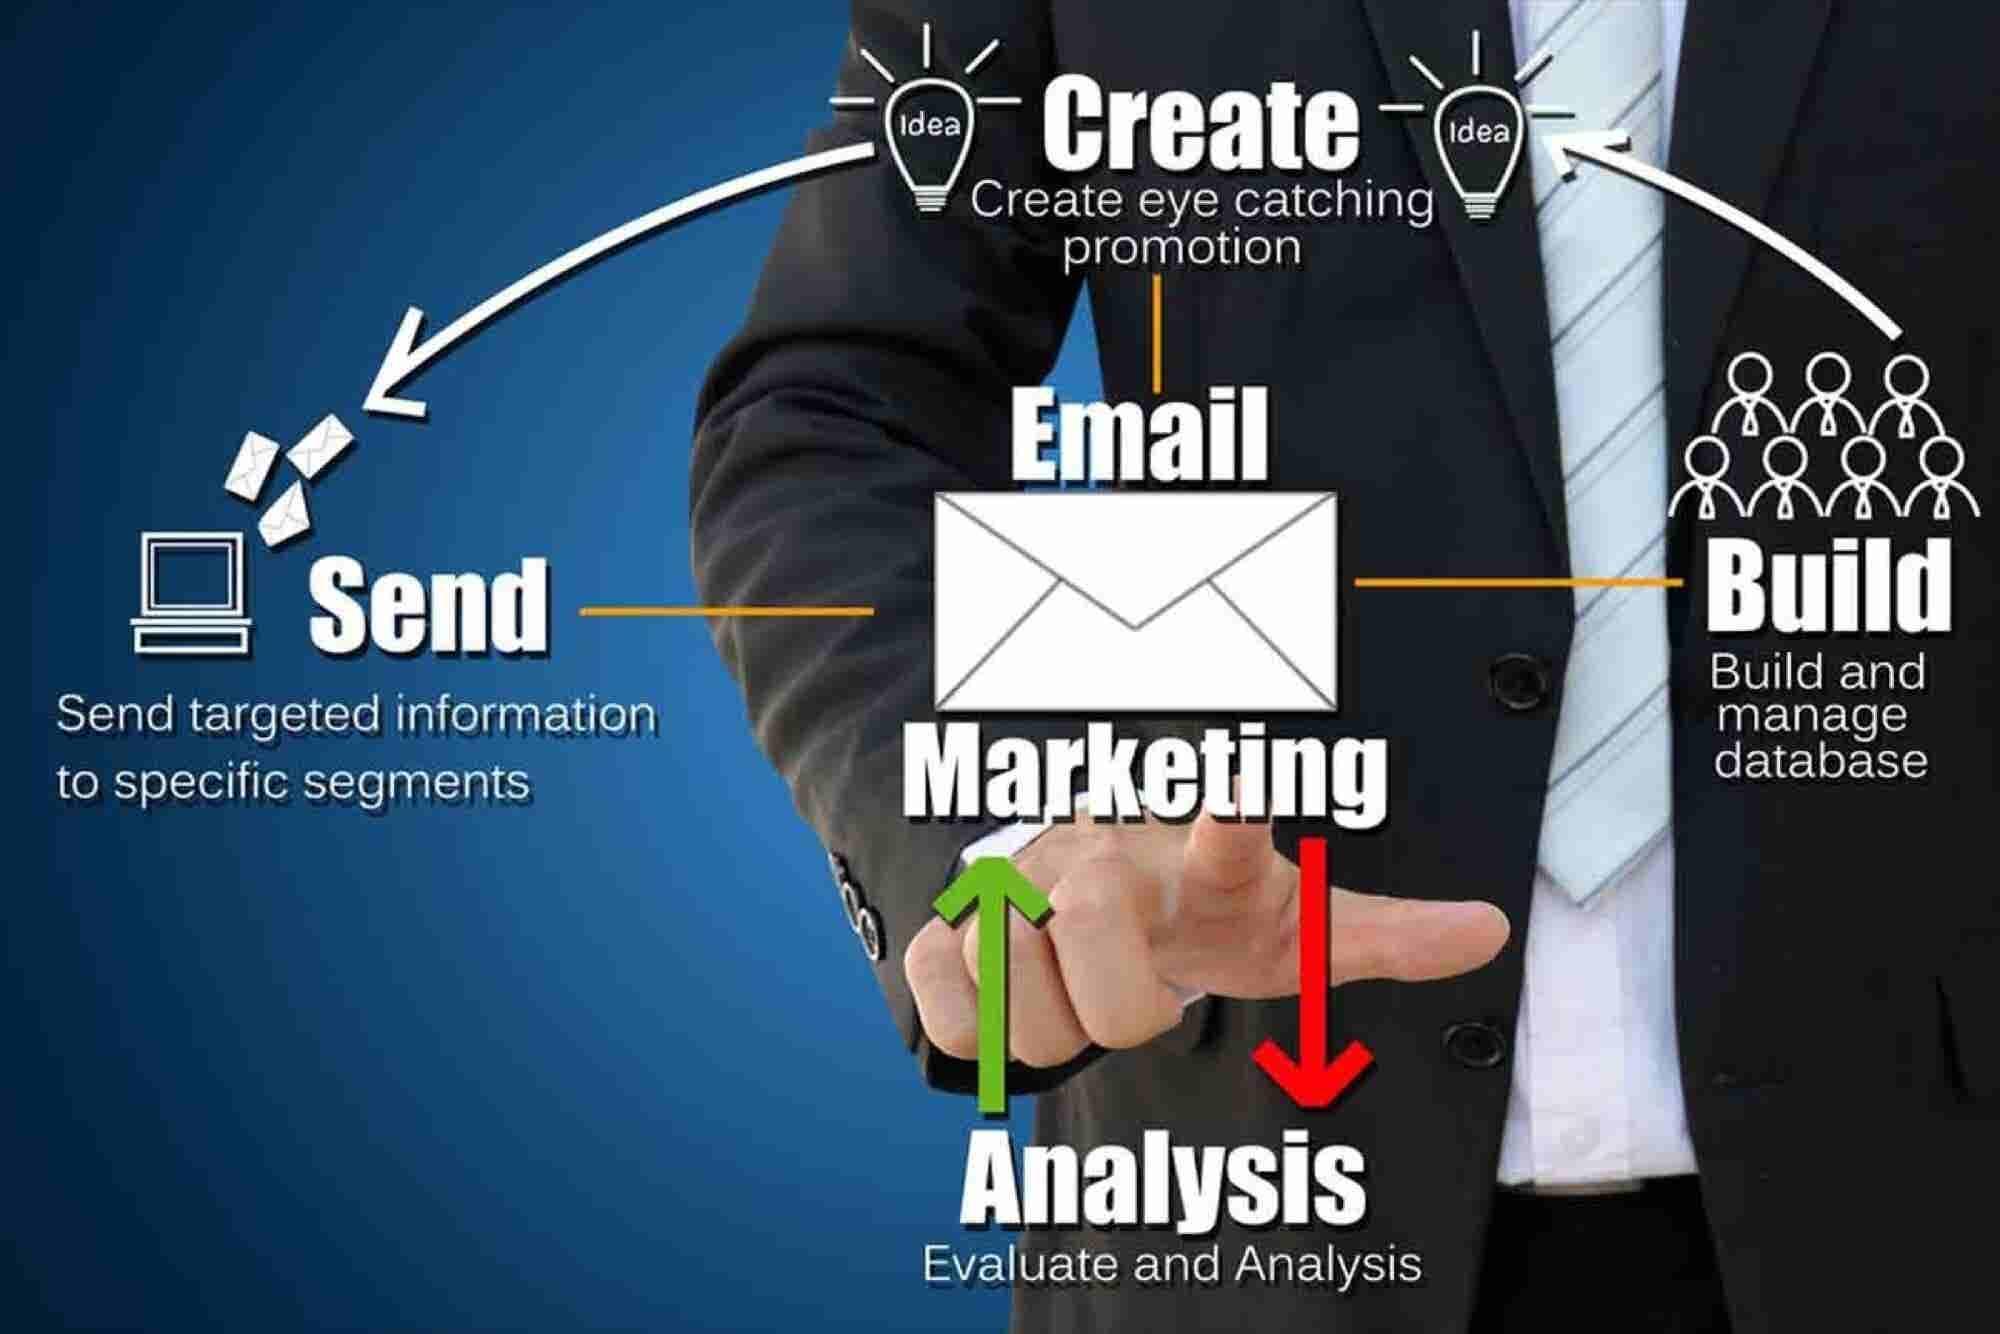 How Do Brands Perform Better Via Email?